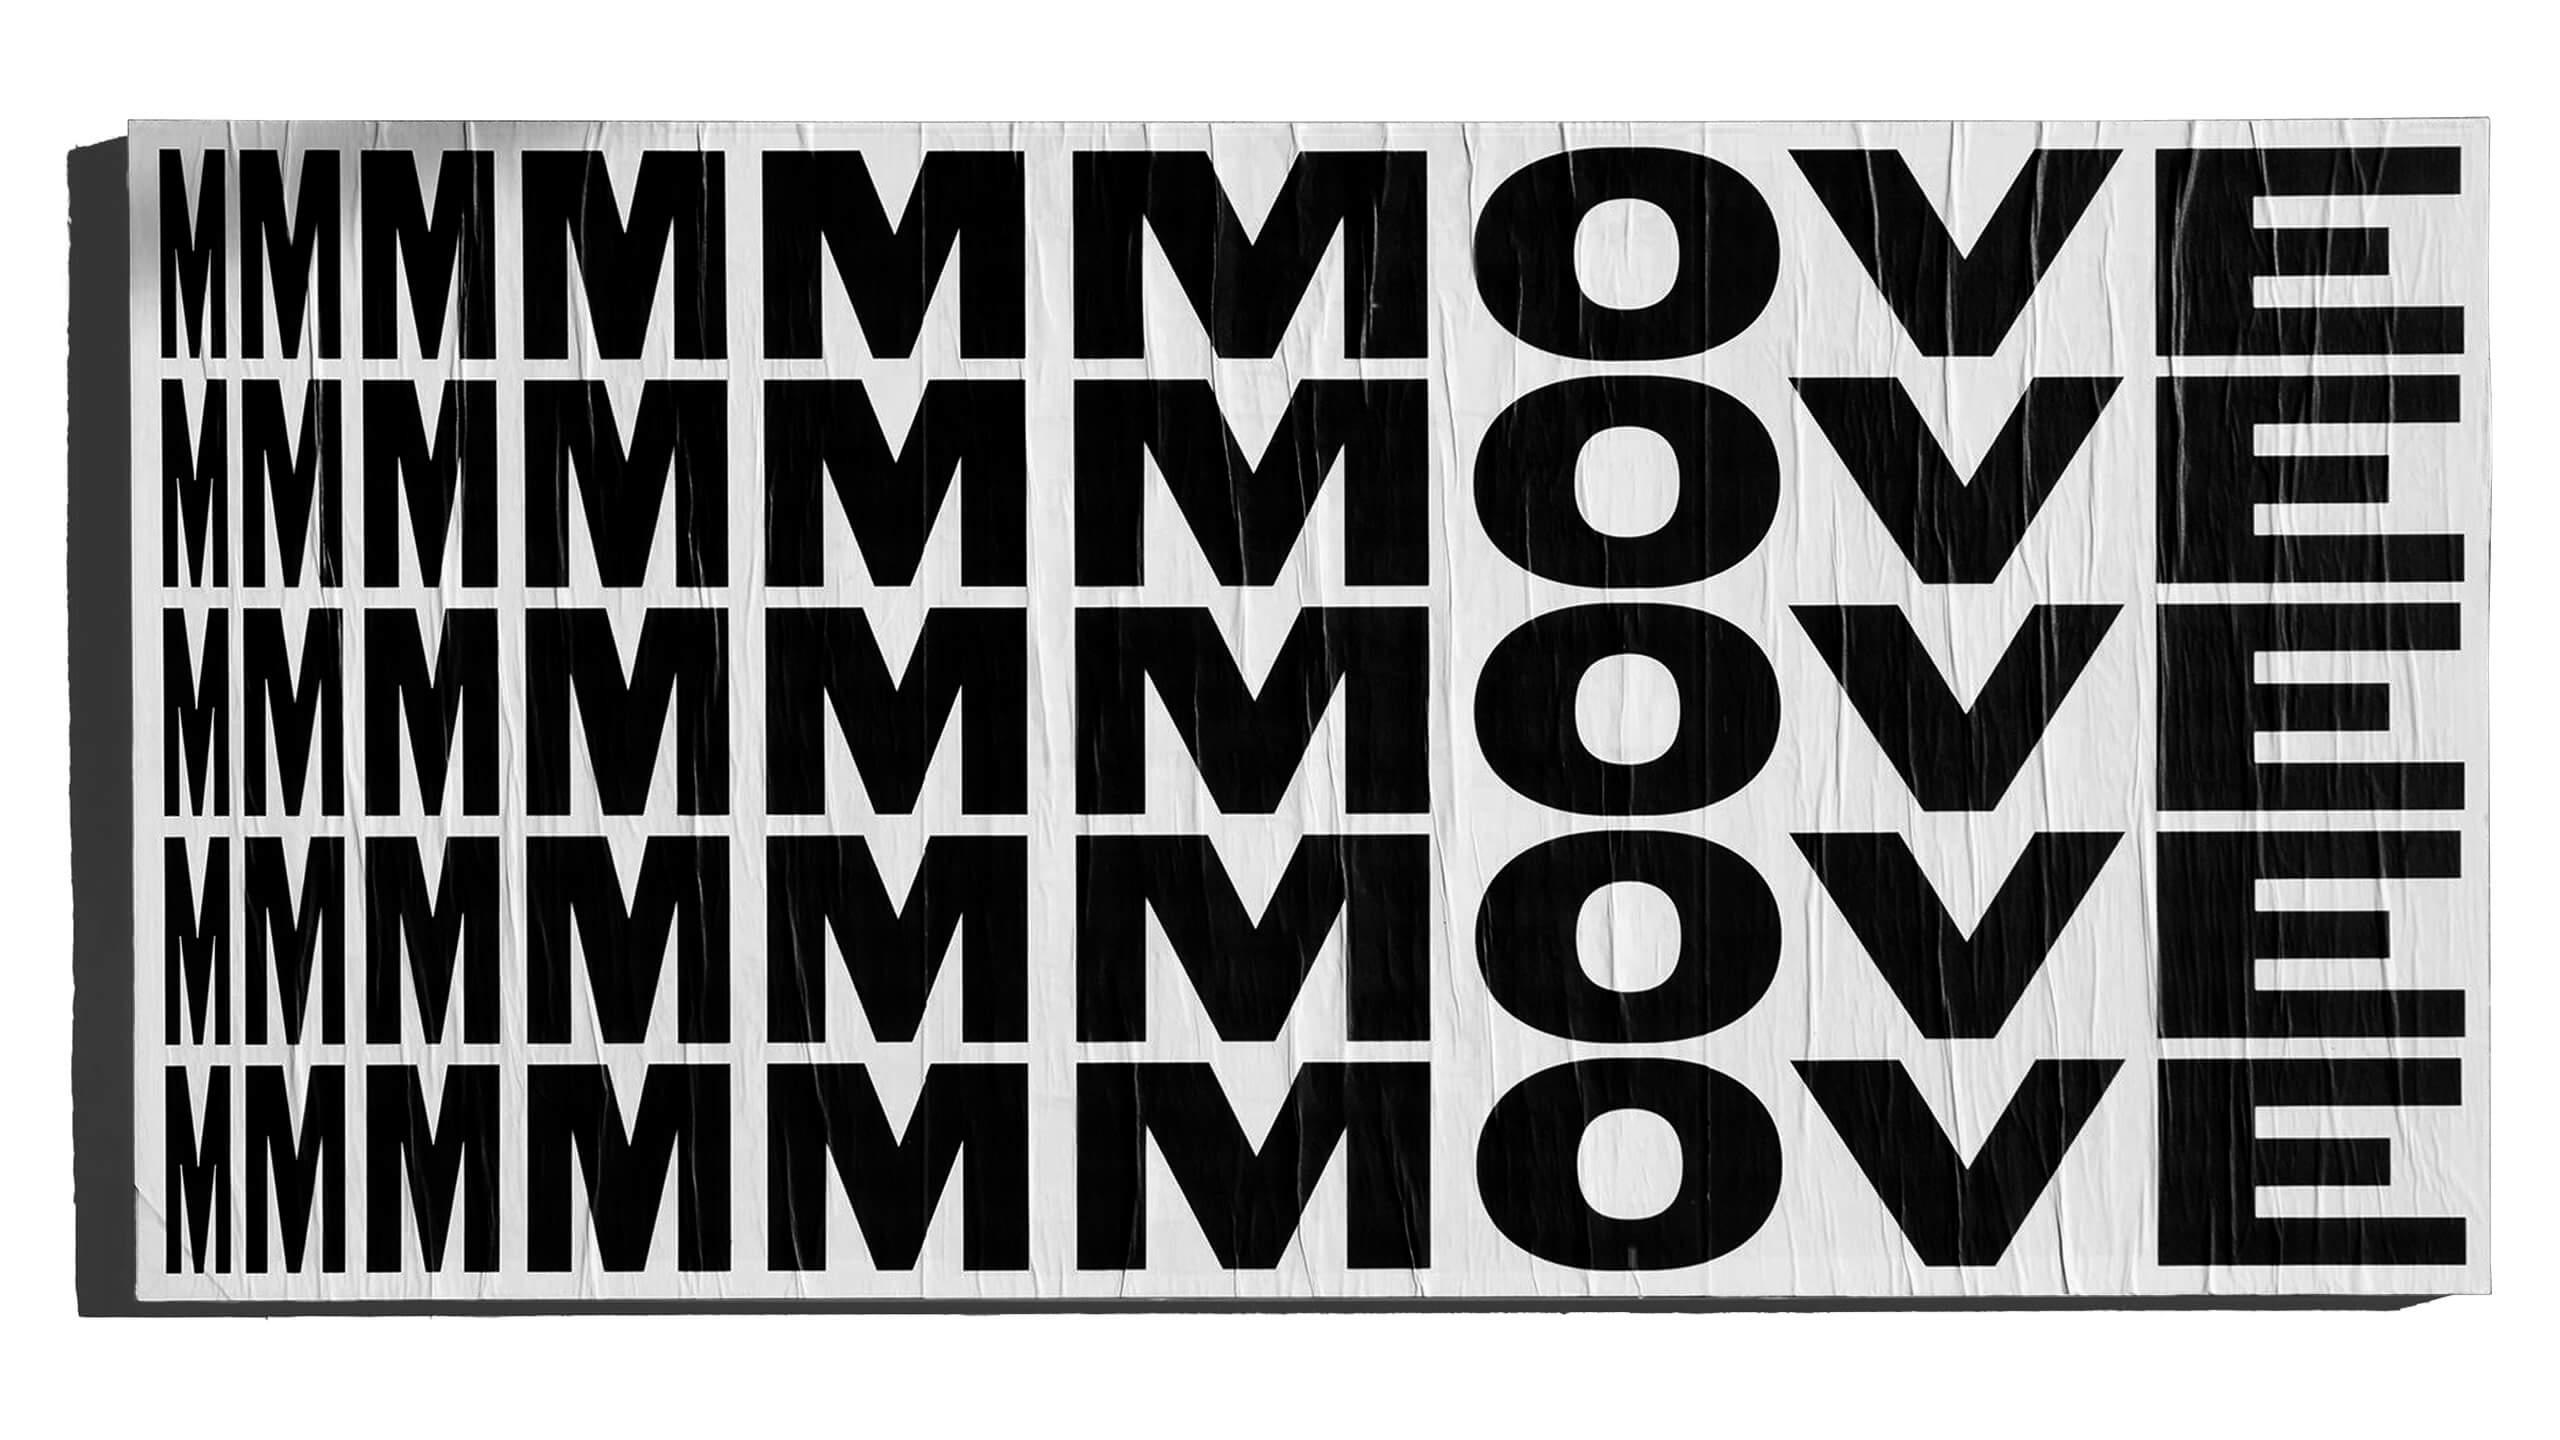 ficciones-typografika_161110_24x36-5